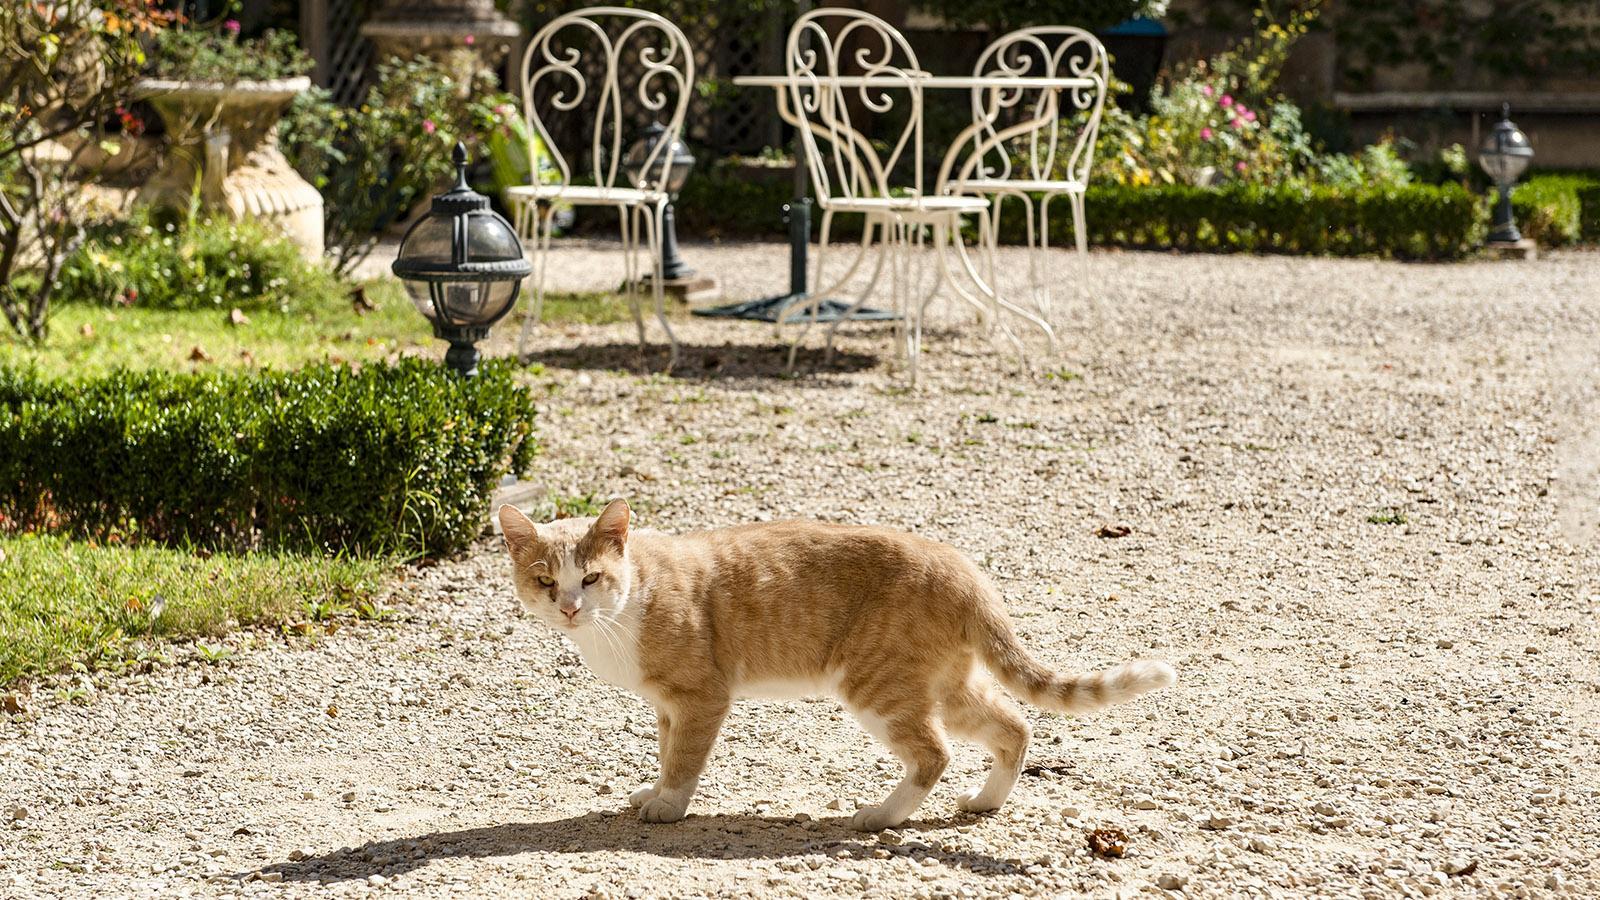 Palais des Évêques: Die Hauskatze tigert im Innenhof-Garten umher. Foto: Hilke Maunder